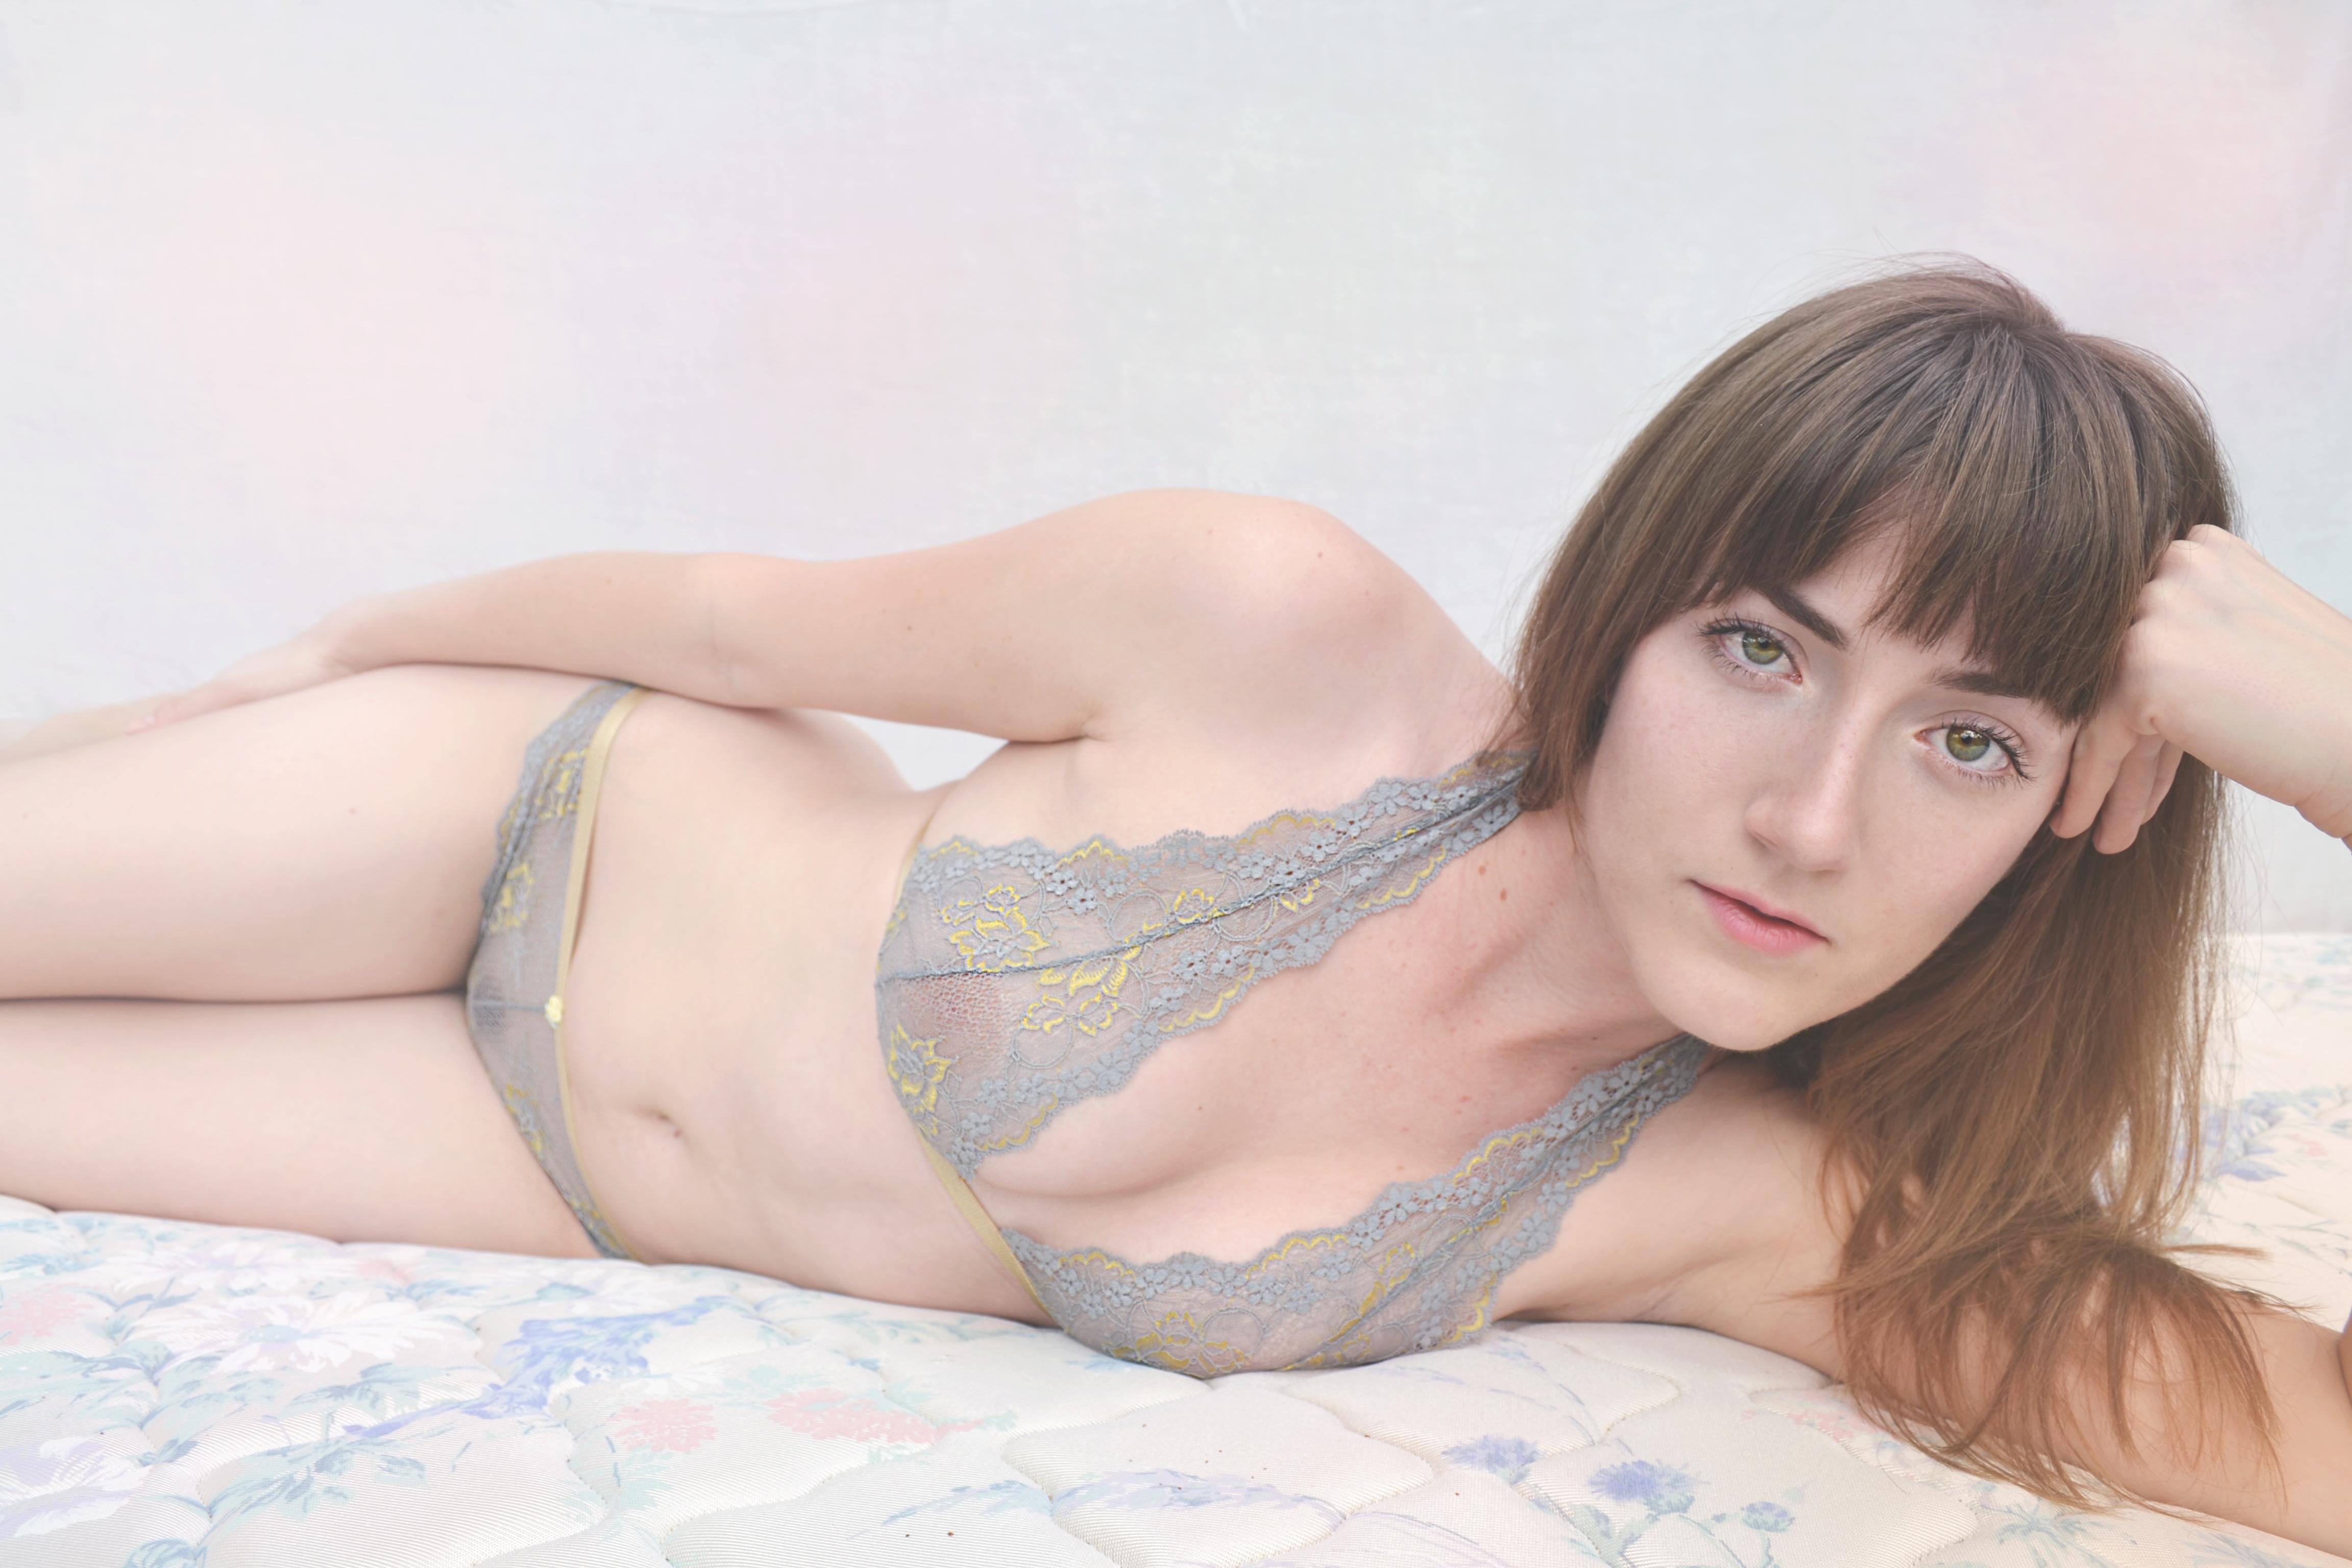 zartes Veilchenblau Foto: Stephanie Sexton Model: Hannah Barrens